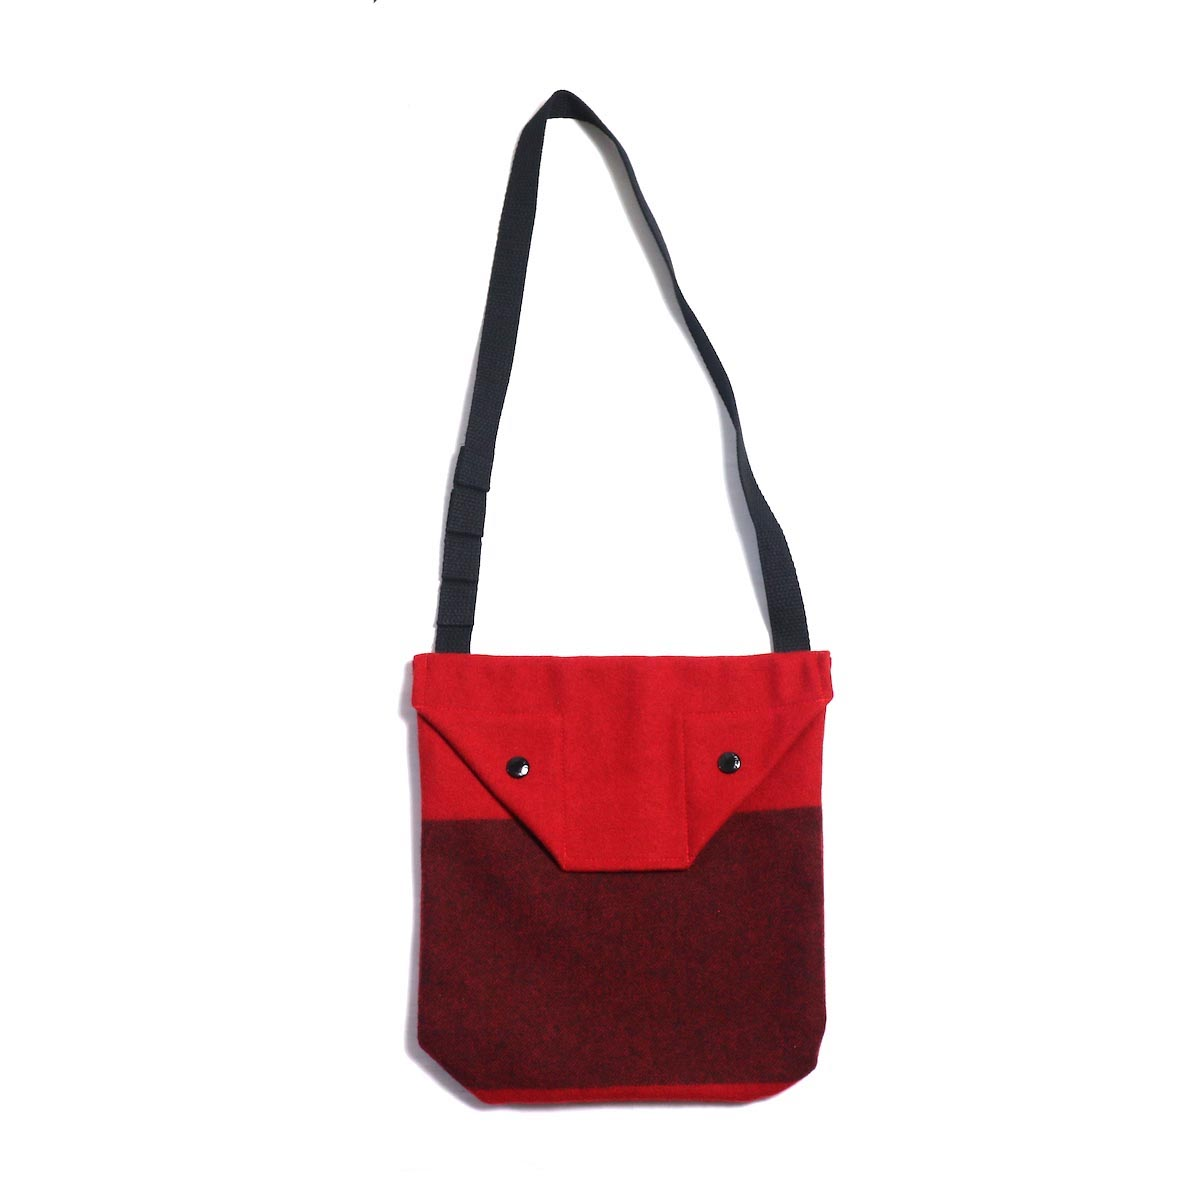 Engineered Garments / Shoulder Pouch - Big Plaid Wool Melton (Black)Engineered Garments / Shoulder Pouch - Big Plaid Wool Melton (Red)